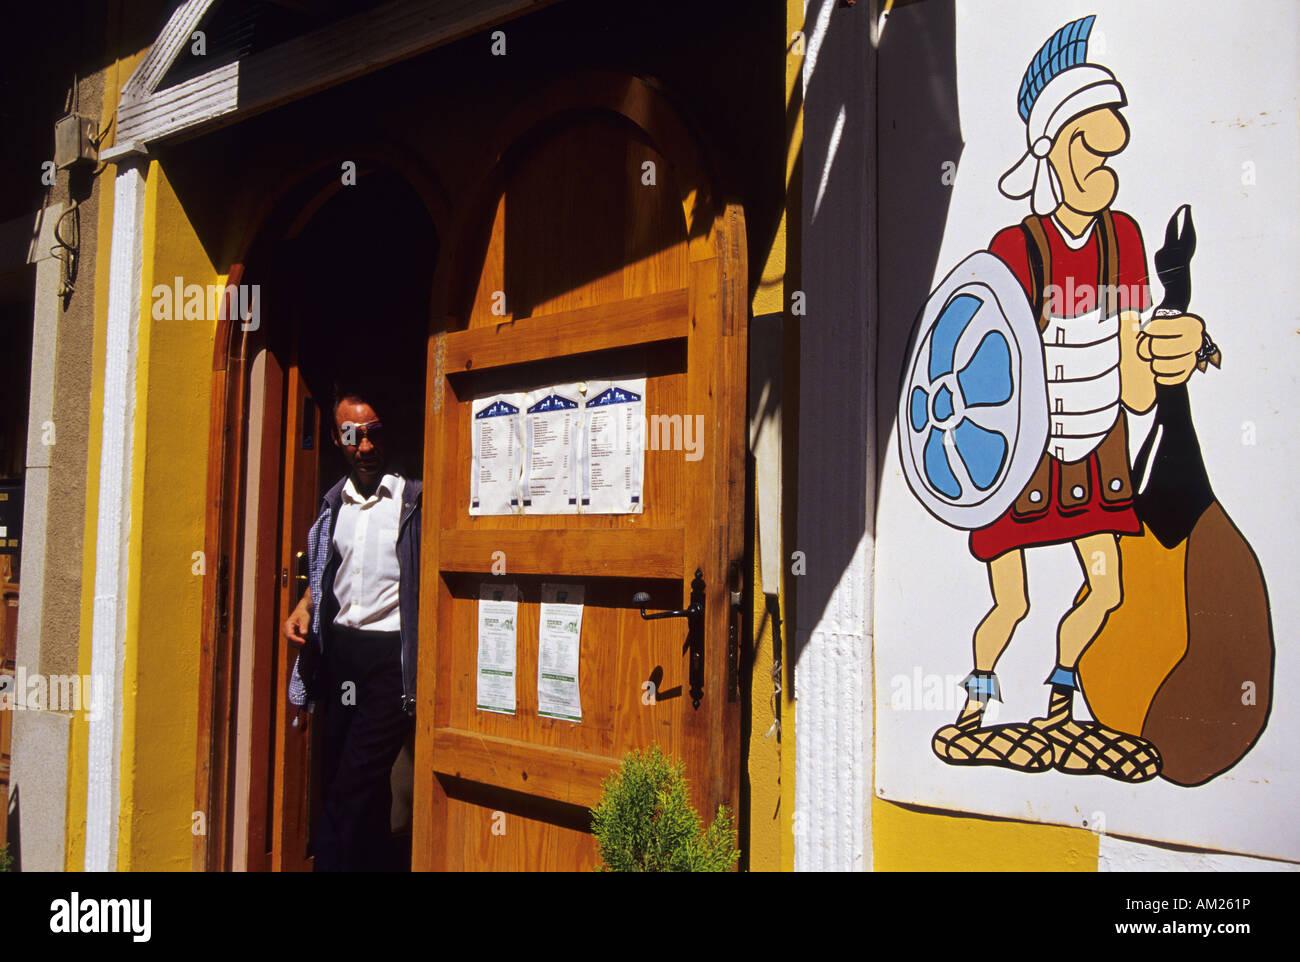 Bar MERIDA Badajoz Extremadura Spain - Stock Image